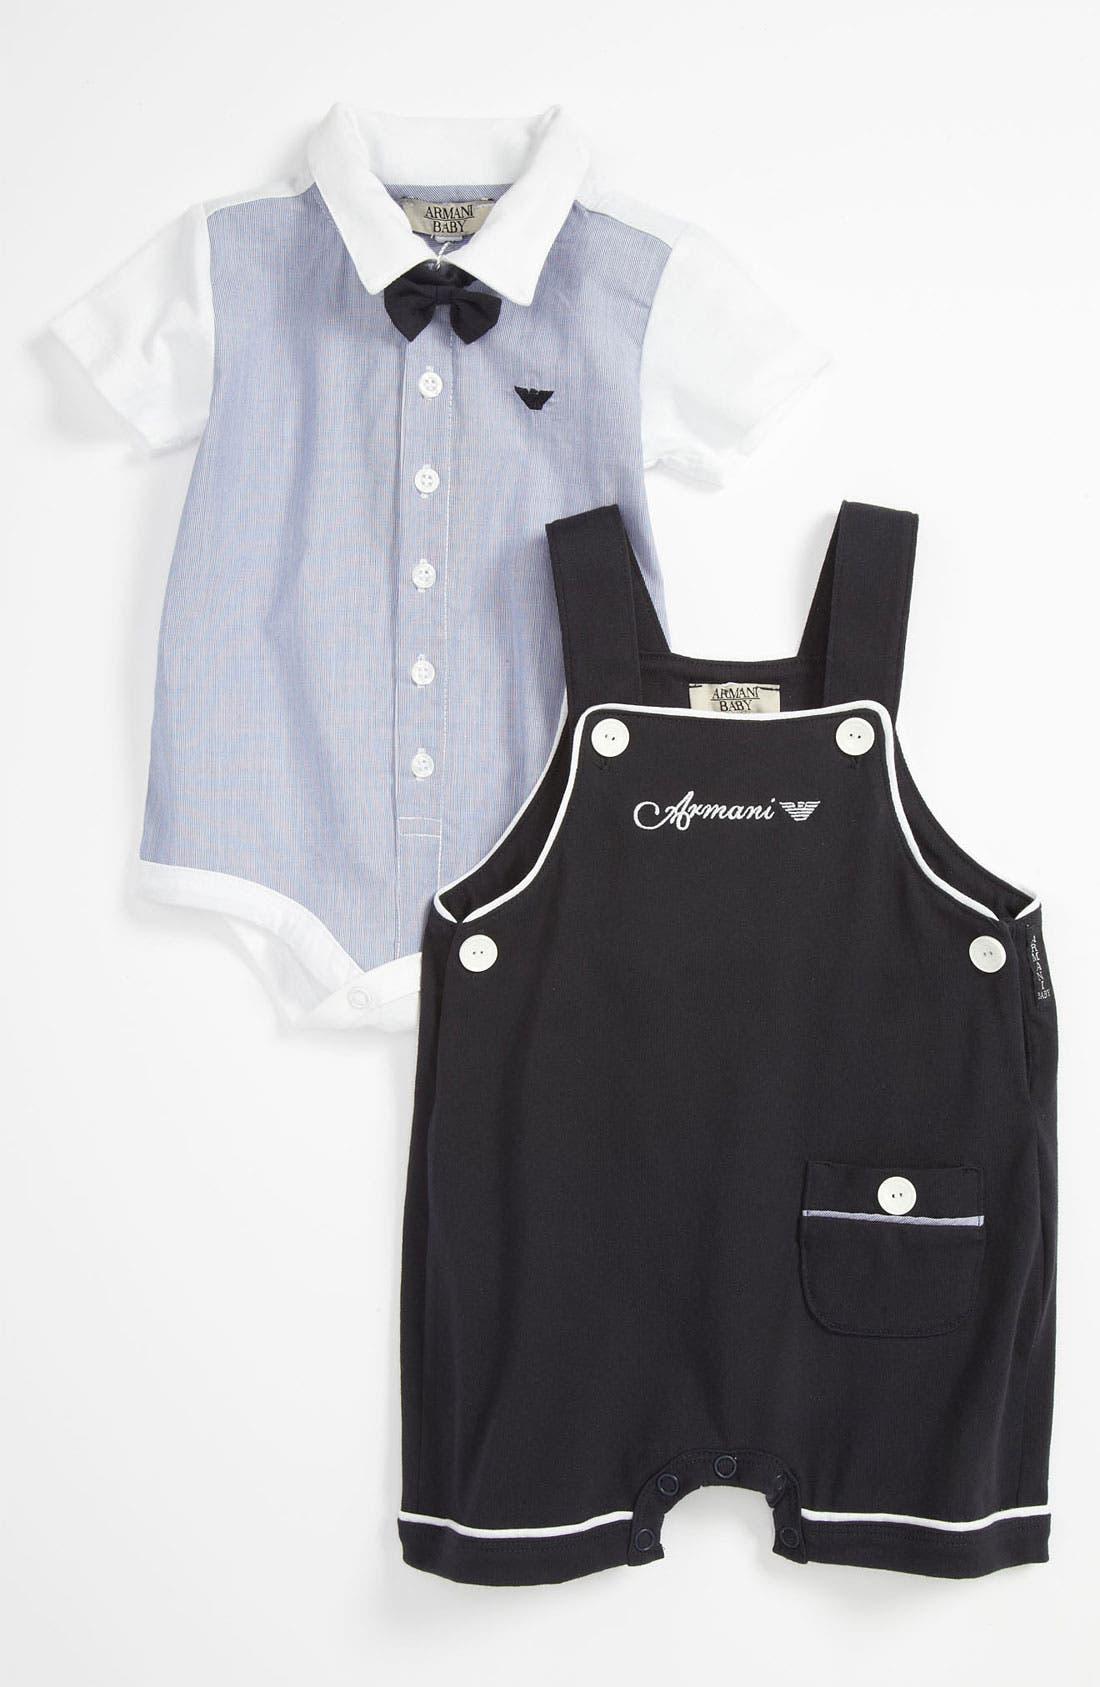 Alternate Image 1 Selected - Armani Junior Bodysuit, Overalls & Bow Tie (Infant)